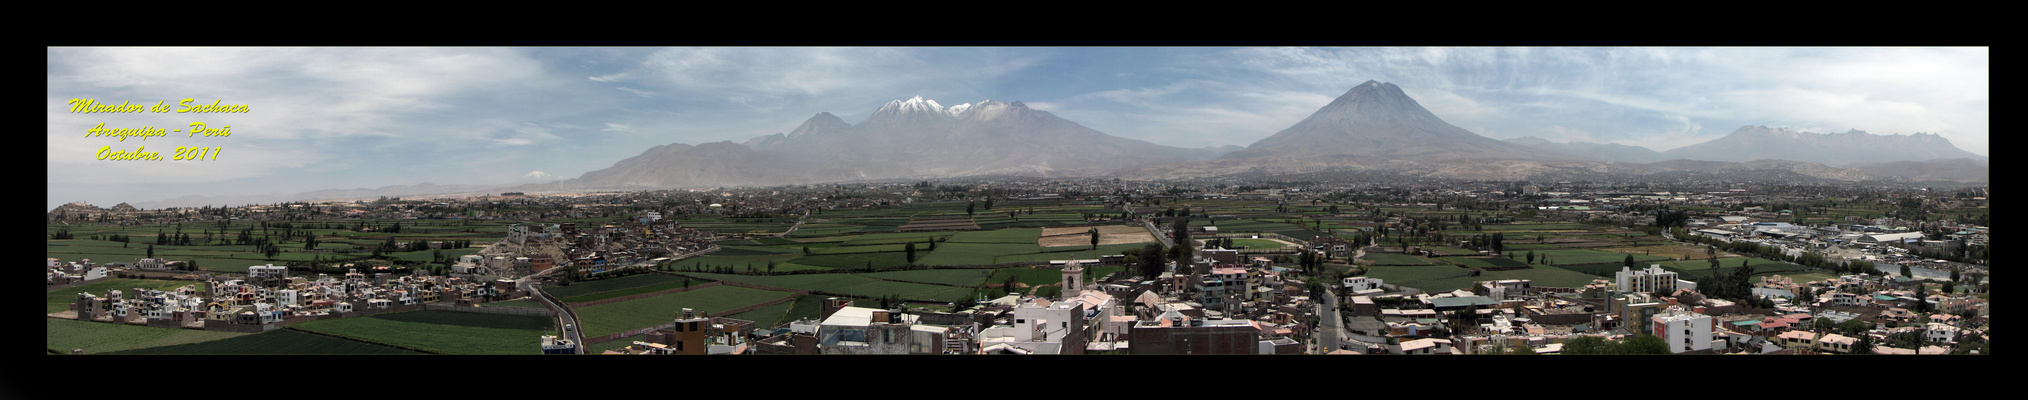 Mirador de Sachaca, Arequipa - Peru